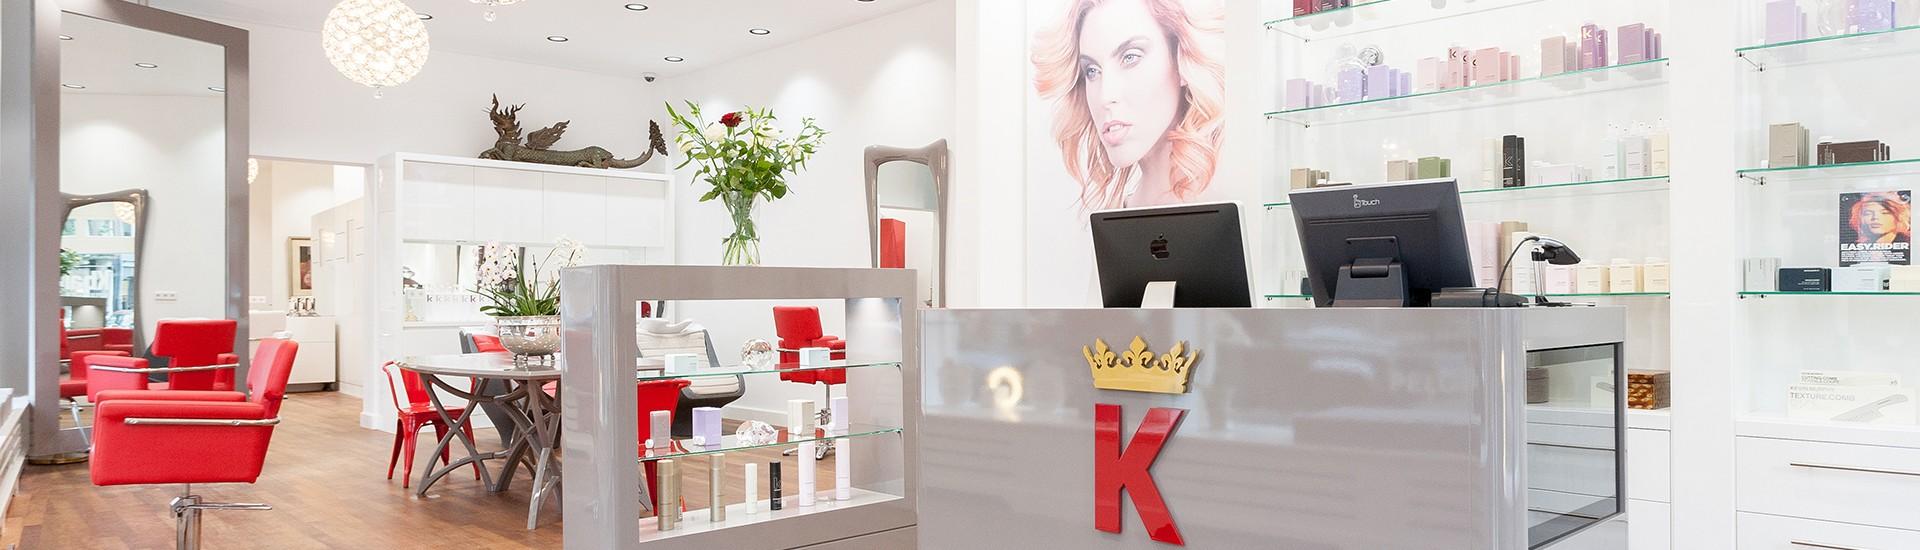 Kbal-hairstylist-Kapsalon-Amsterdam03